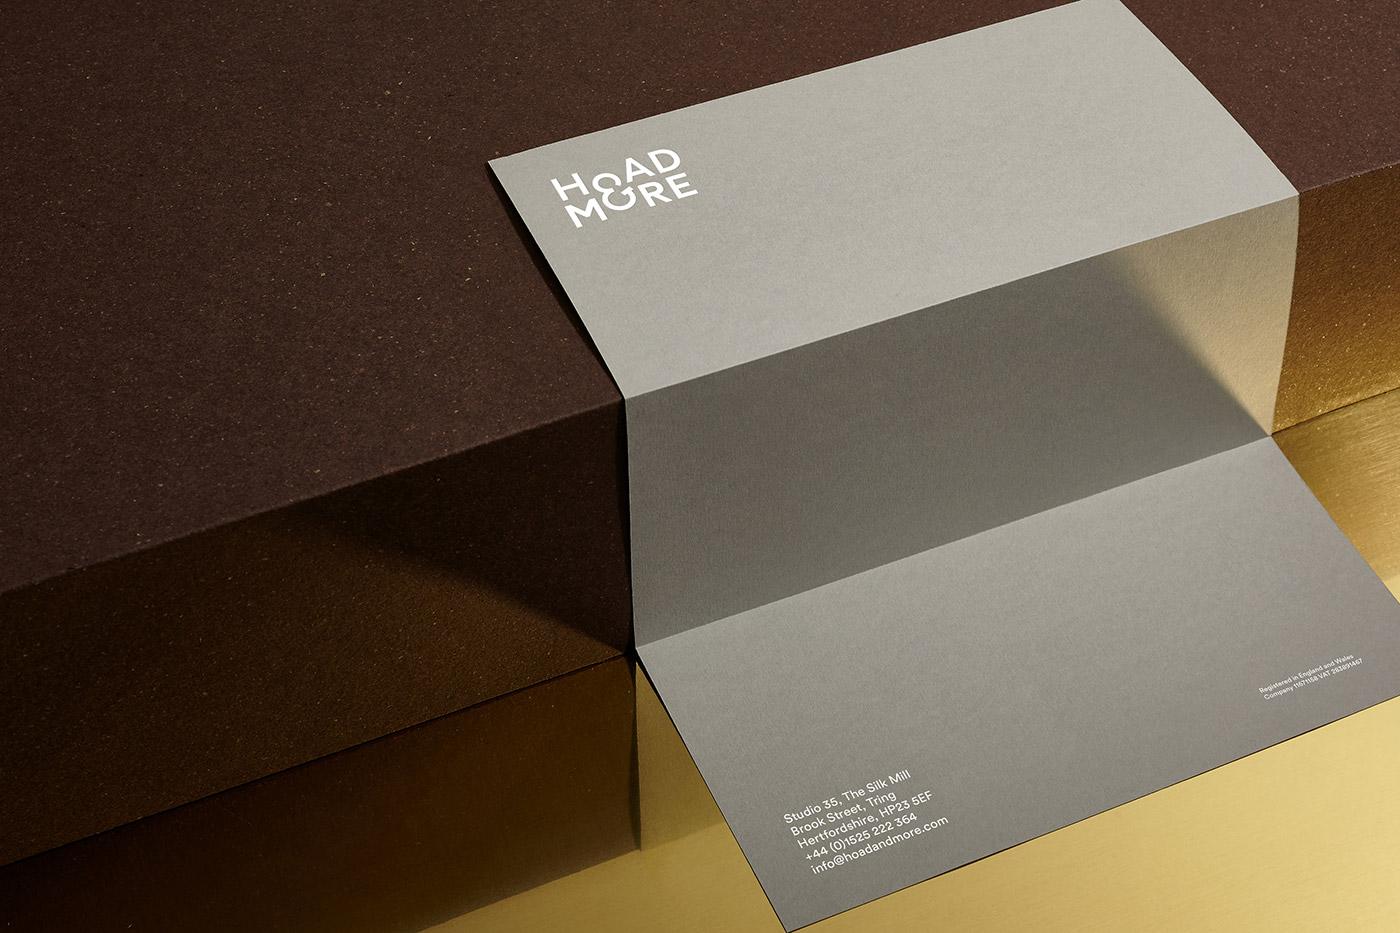 Hoad & More letterhead design